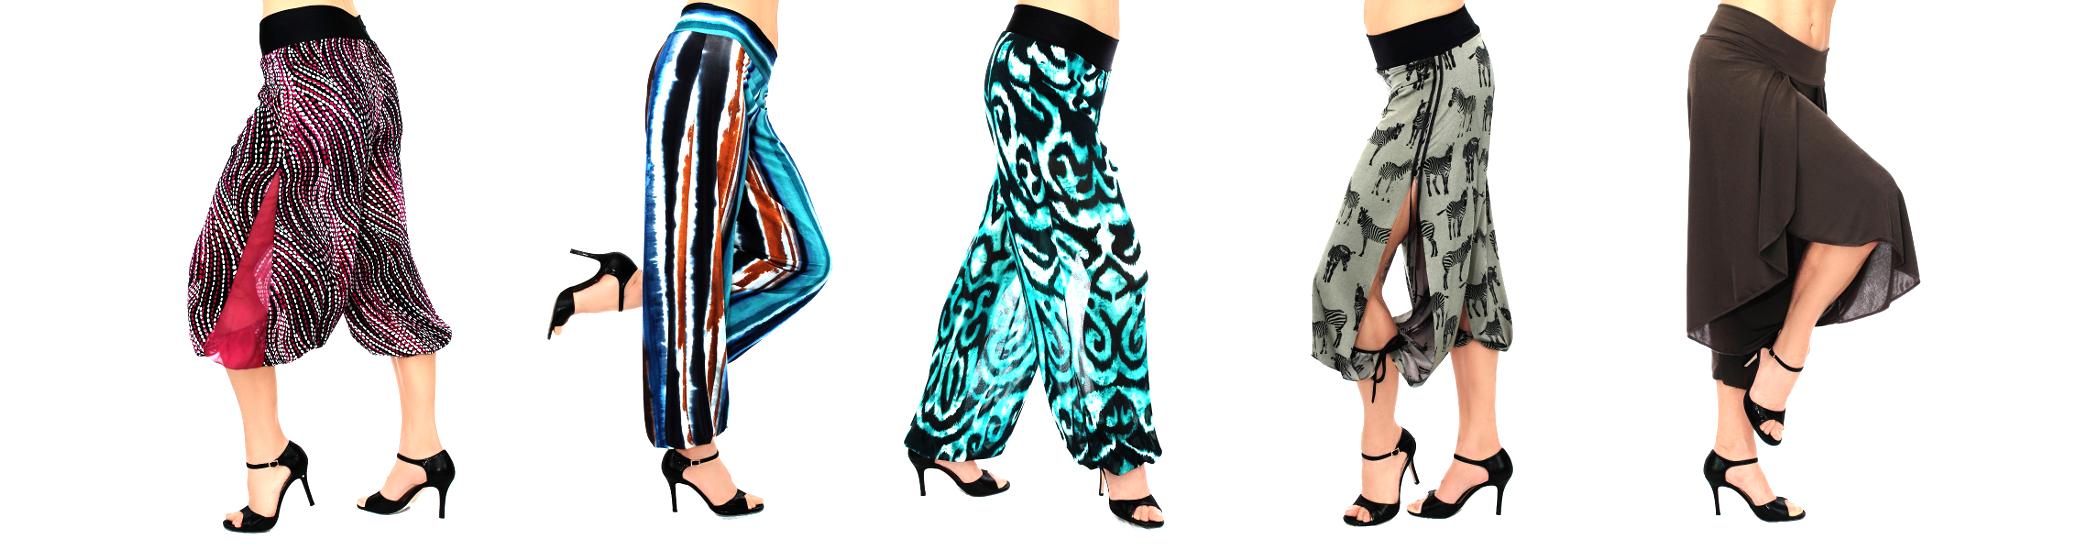 Pantalons de tango pour femmes Iryna